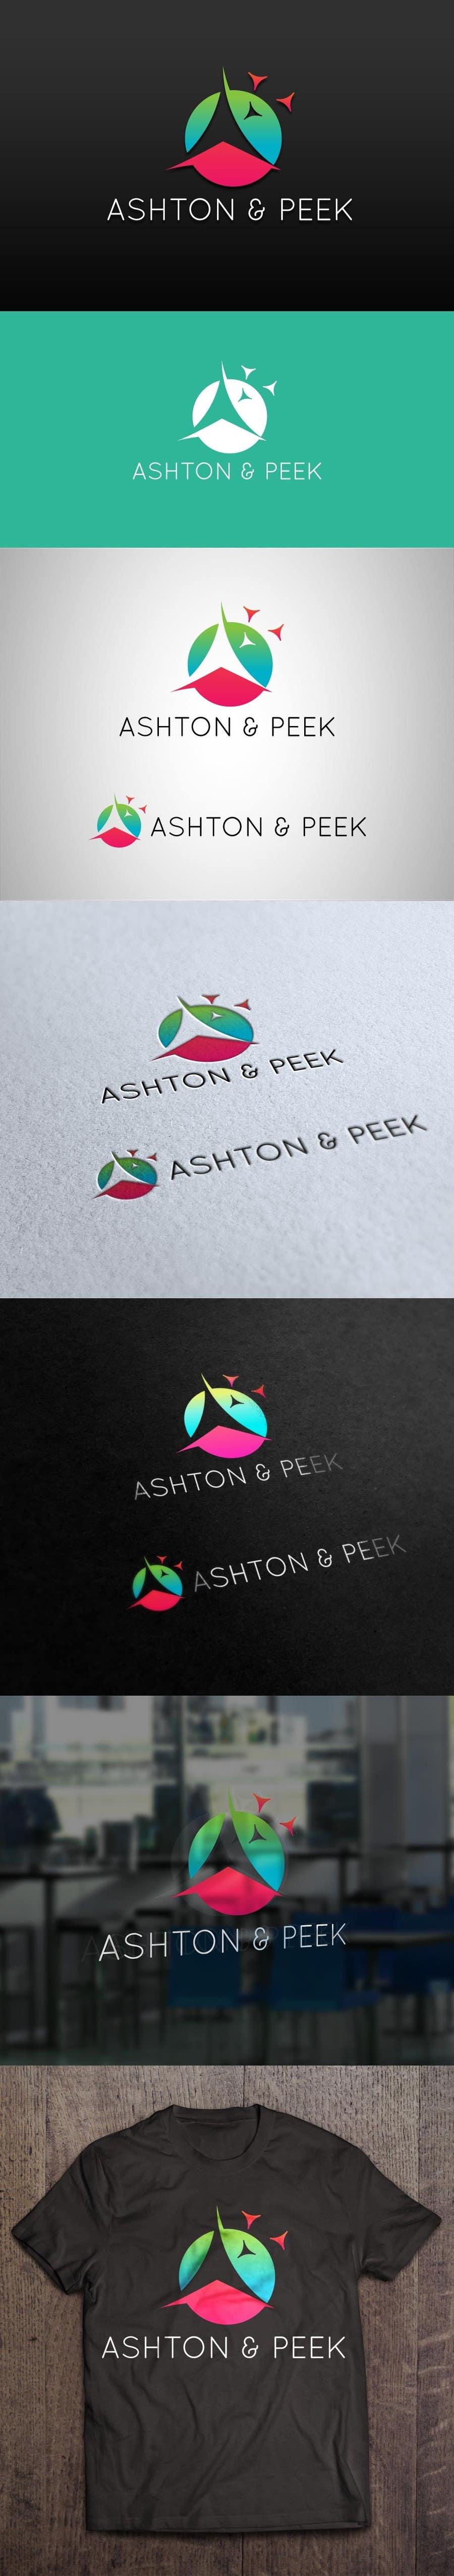 Konkurrenceindlæg #177 for Design a Logo for a Video Production Business